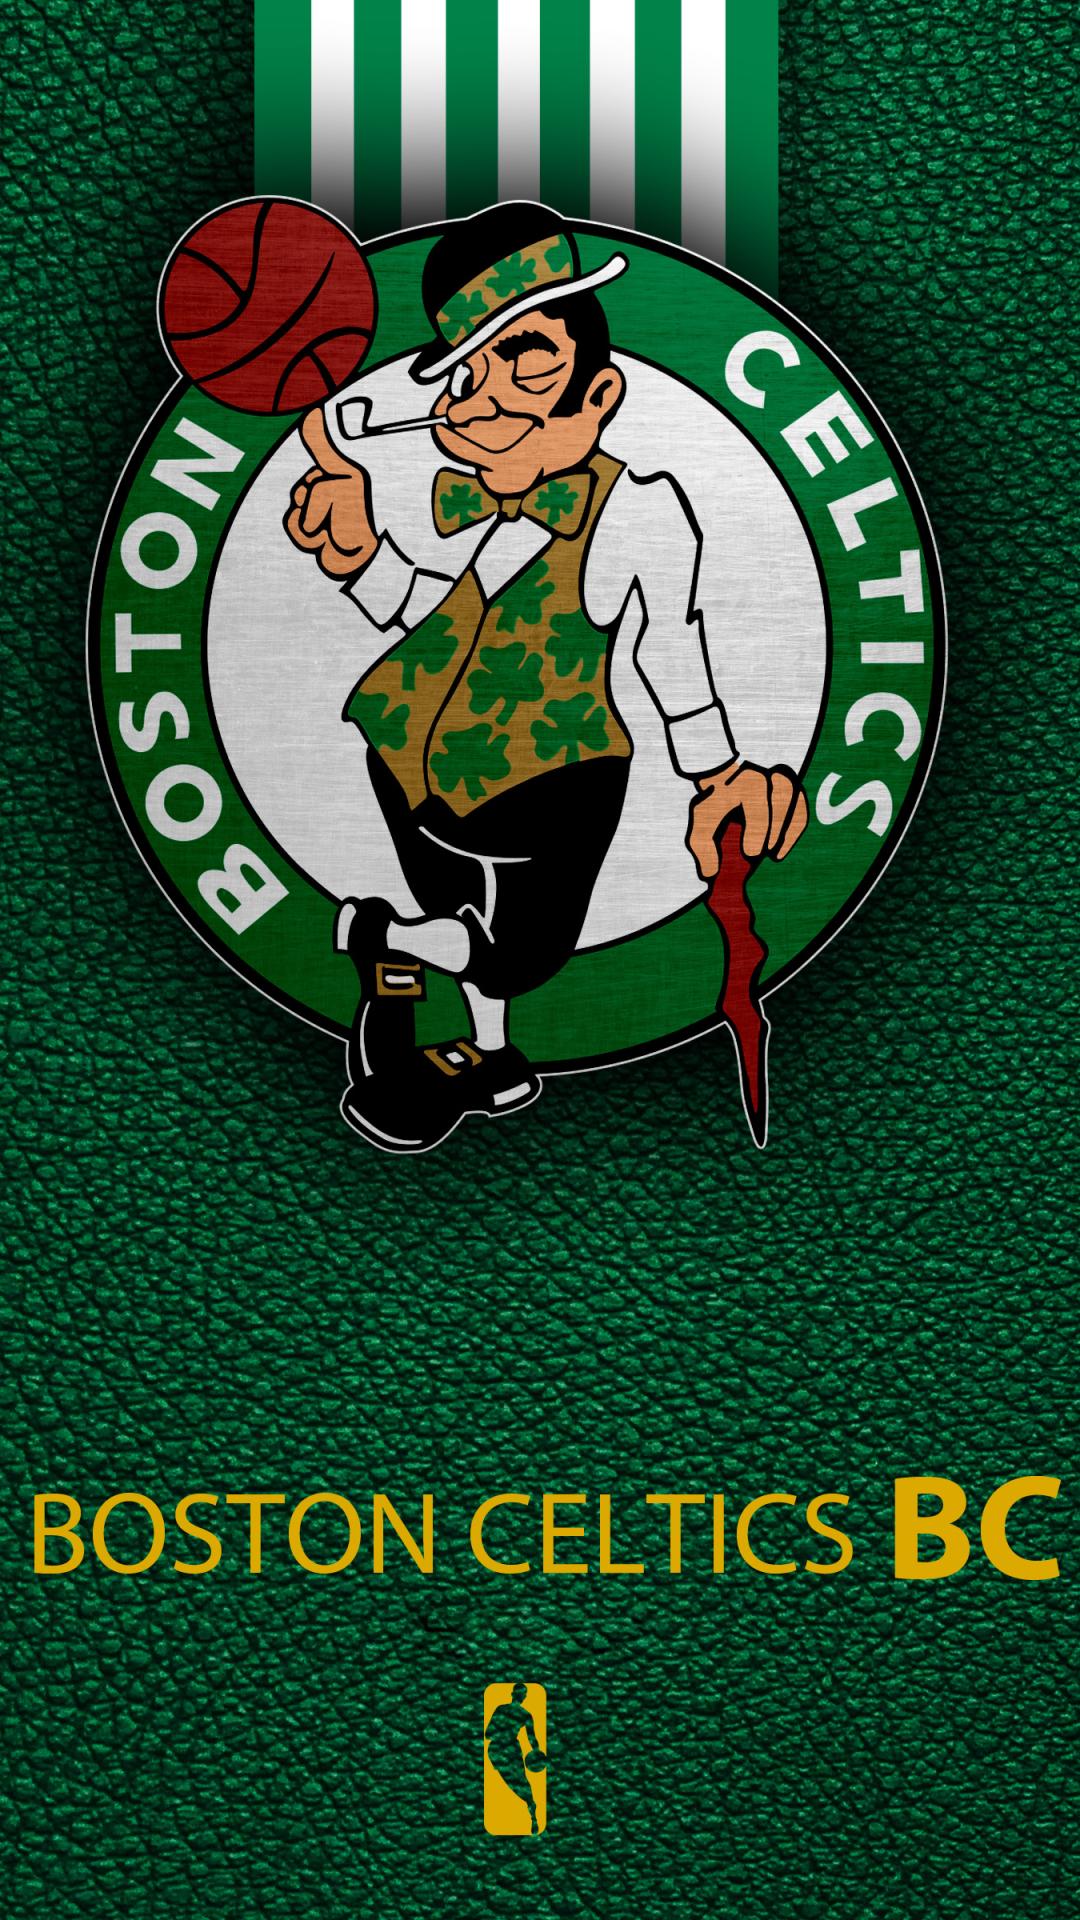 Sports Boston Celtics 1080x1920 Wallpaper Id 827605 Mobile Abyss